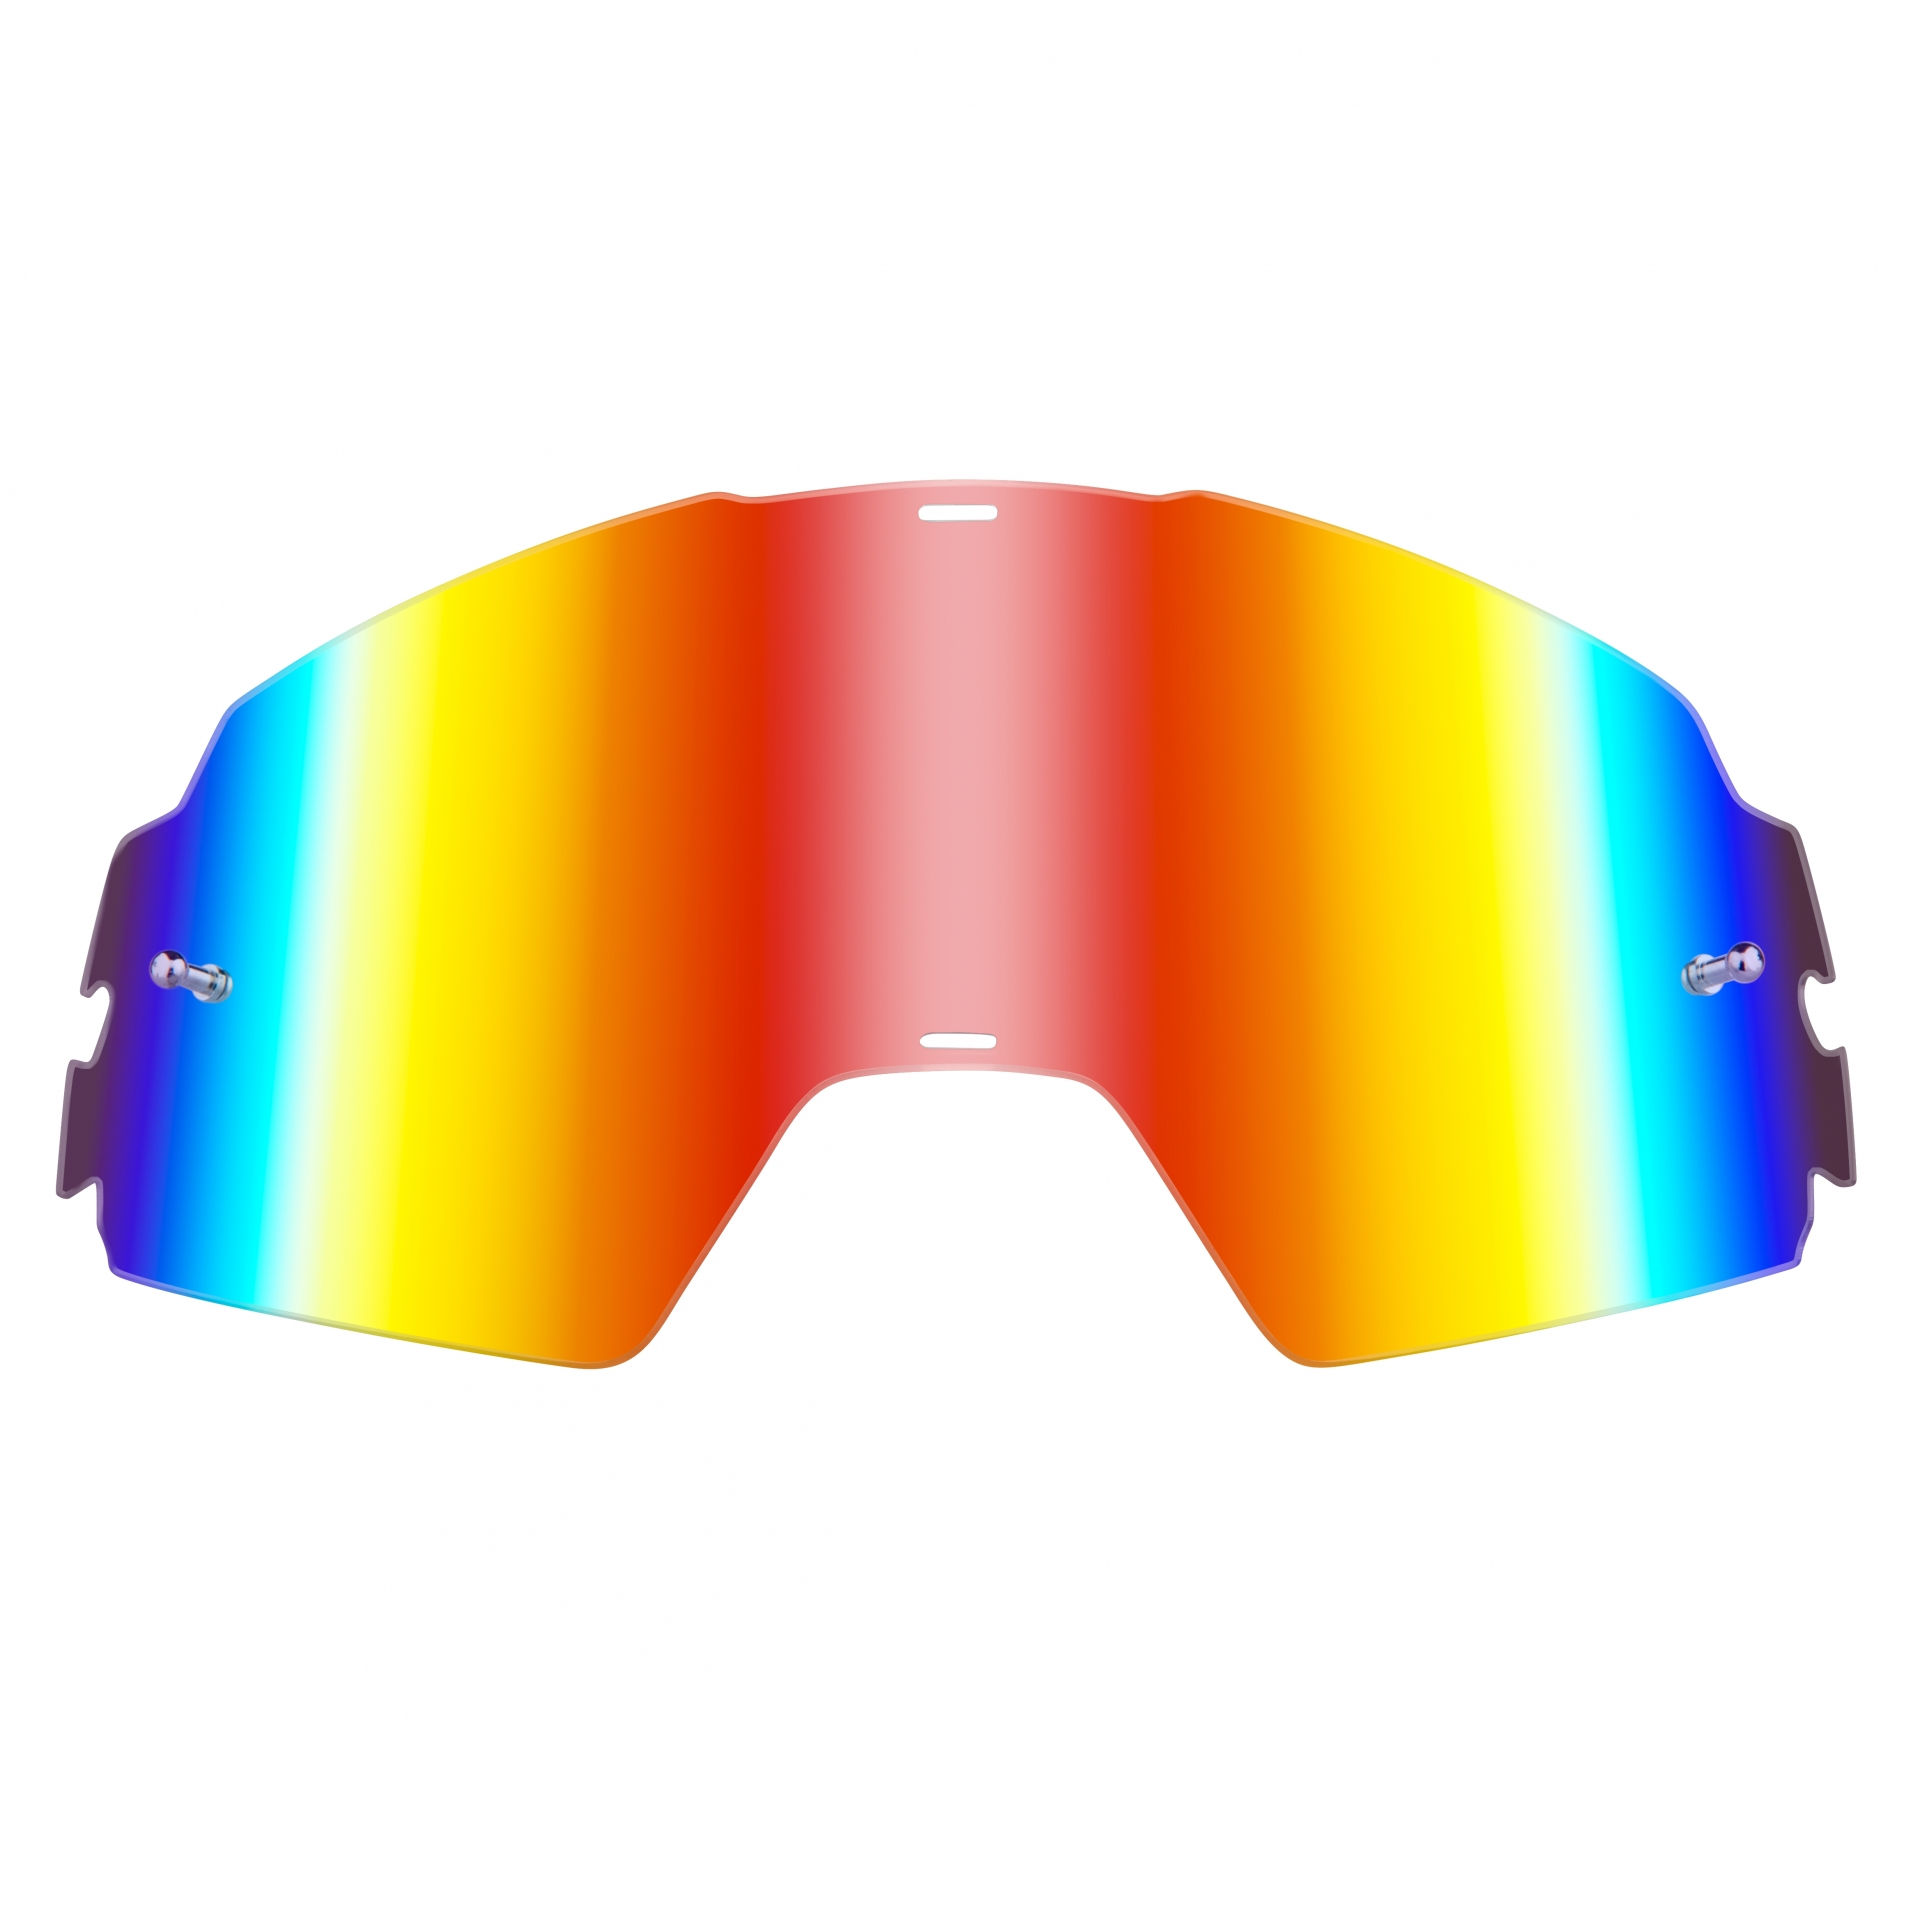 Écran O'Neal pour masque B-20 Goggle Spare Lens Radium Rouge